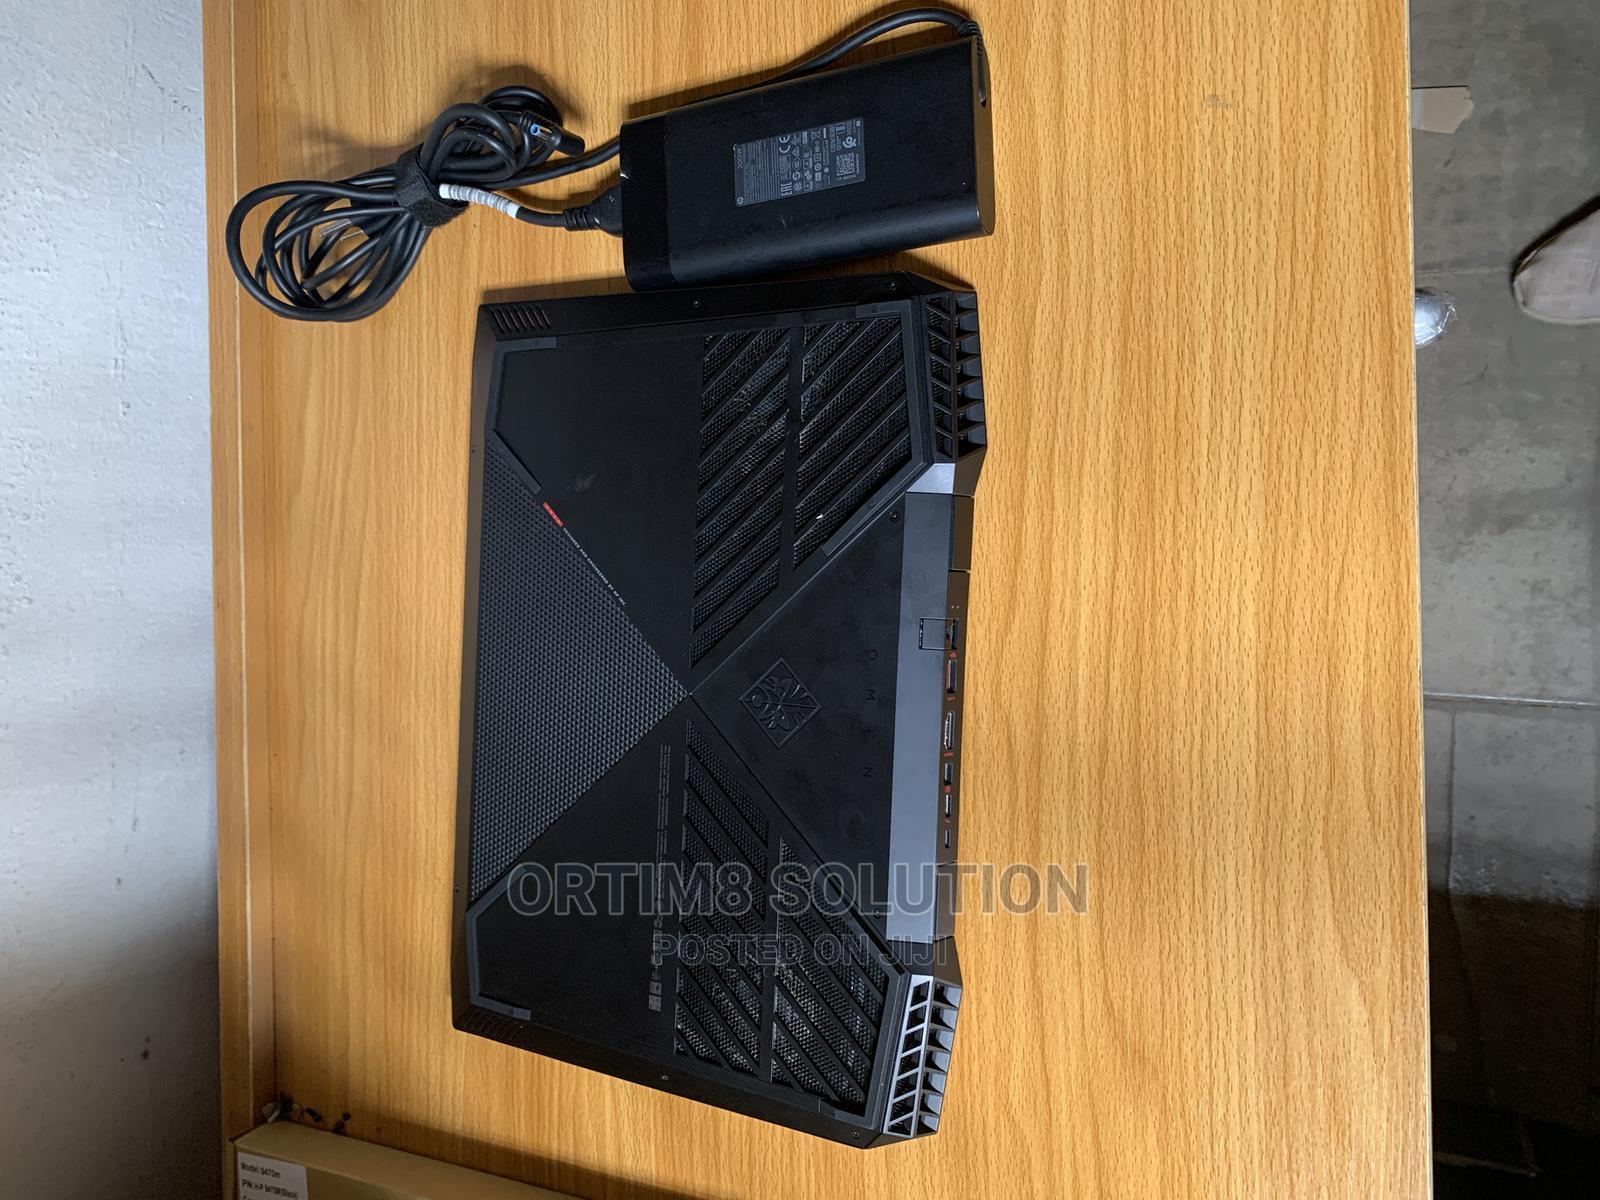 Laptop HP Omen 15-Ce0xx 16GB Intel Core I7 SSHD (Hybrid) 1T | Laptops & Computers for sale in Ikeja, Lagos State, Nigeria